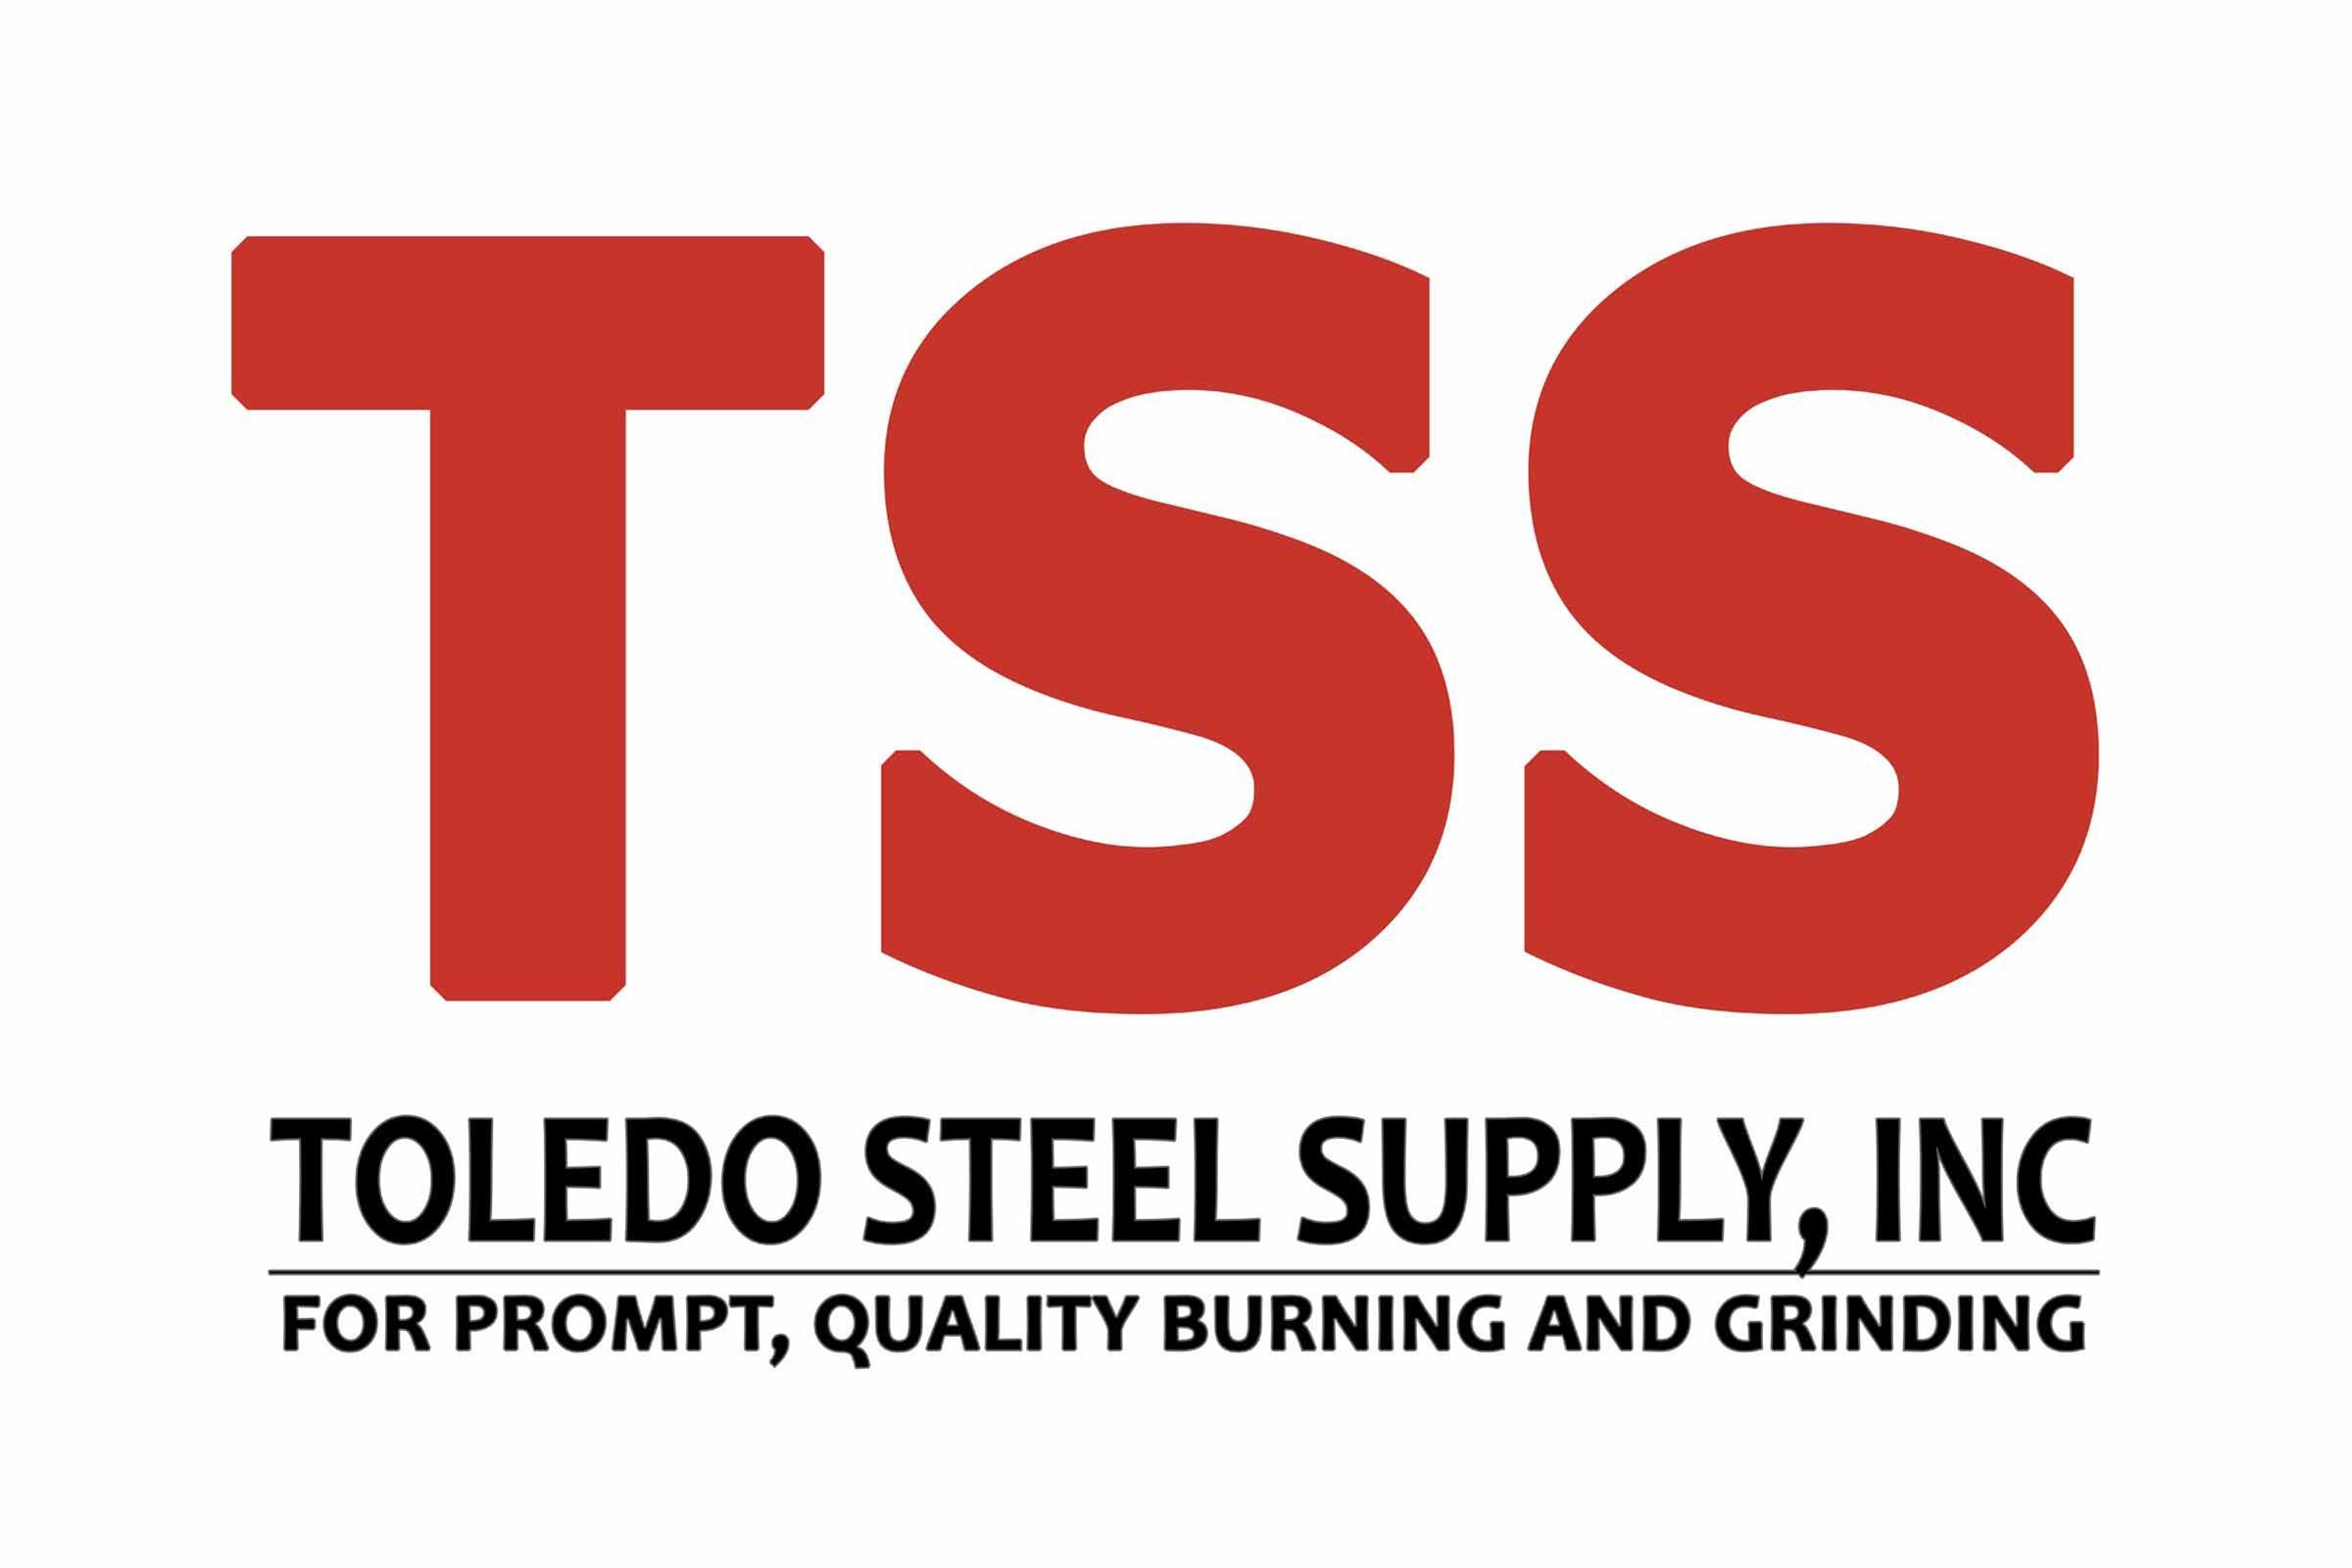 Toledo Steel Supply, Inc. logo